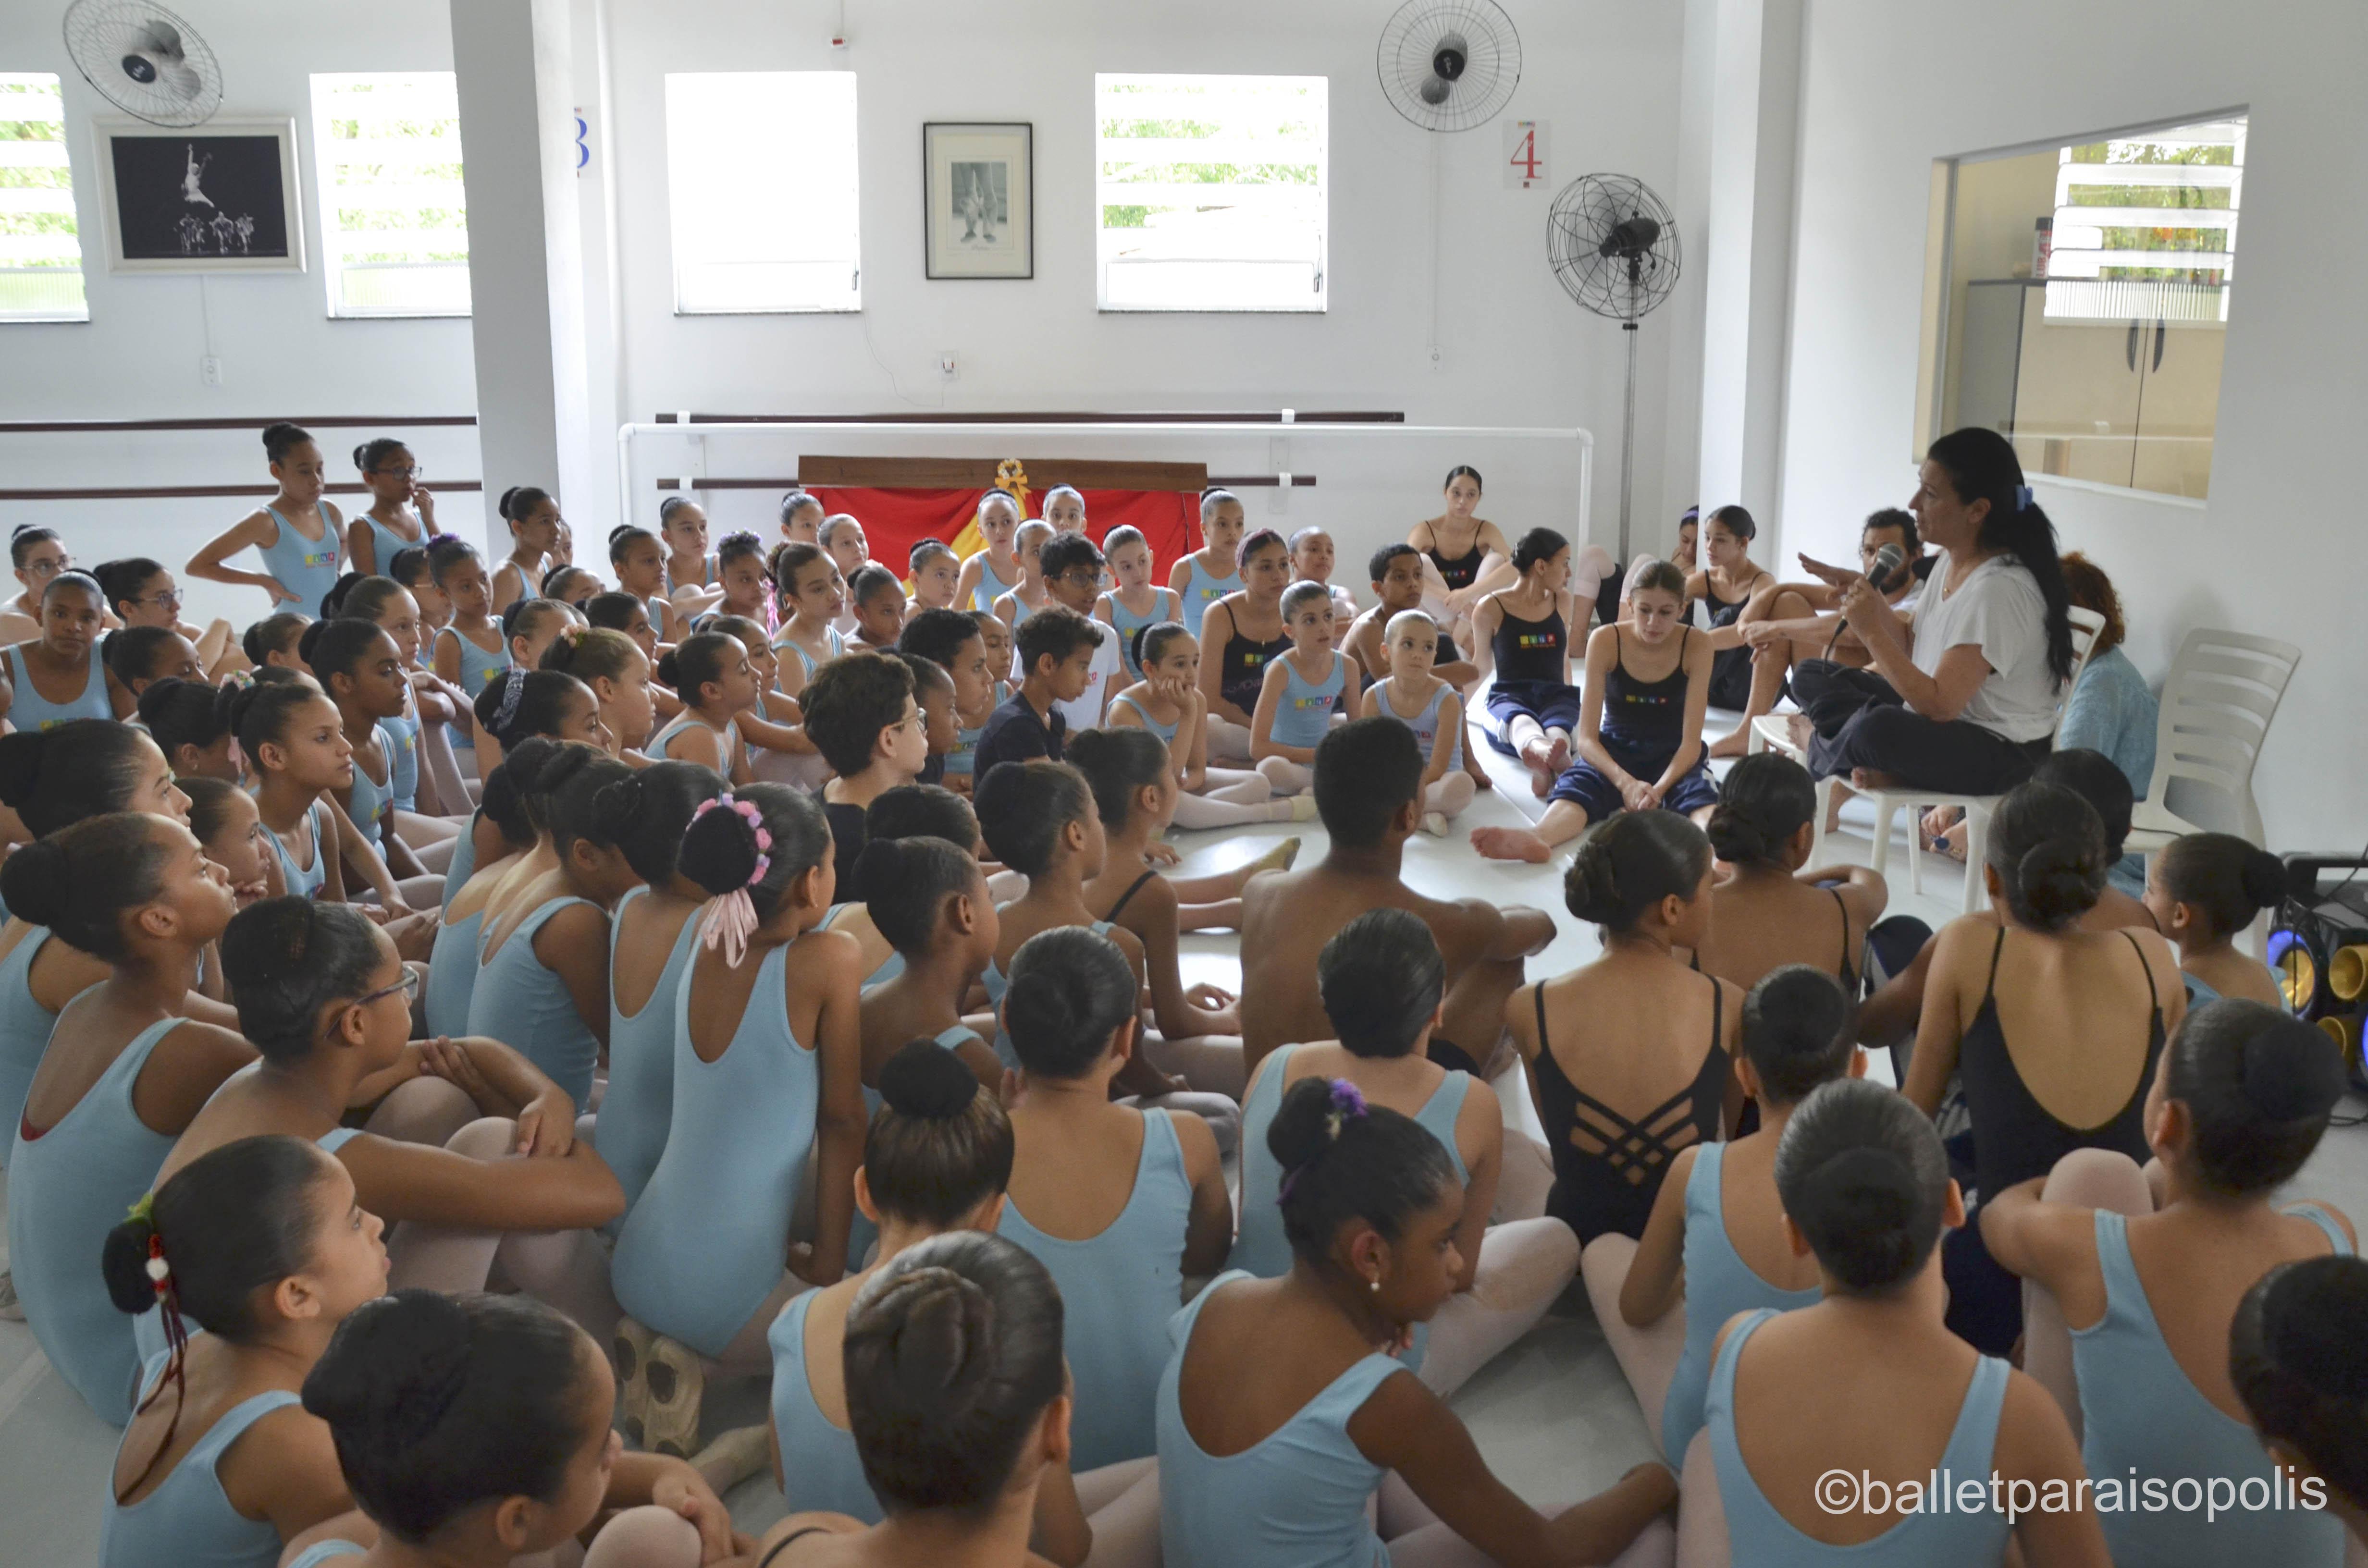 Ballet Paraisopolis BrazilFoundation São Paulo arte